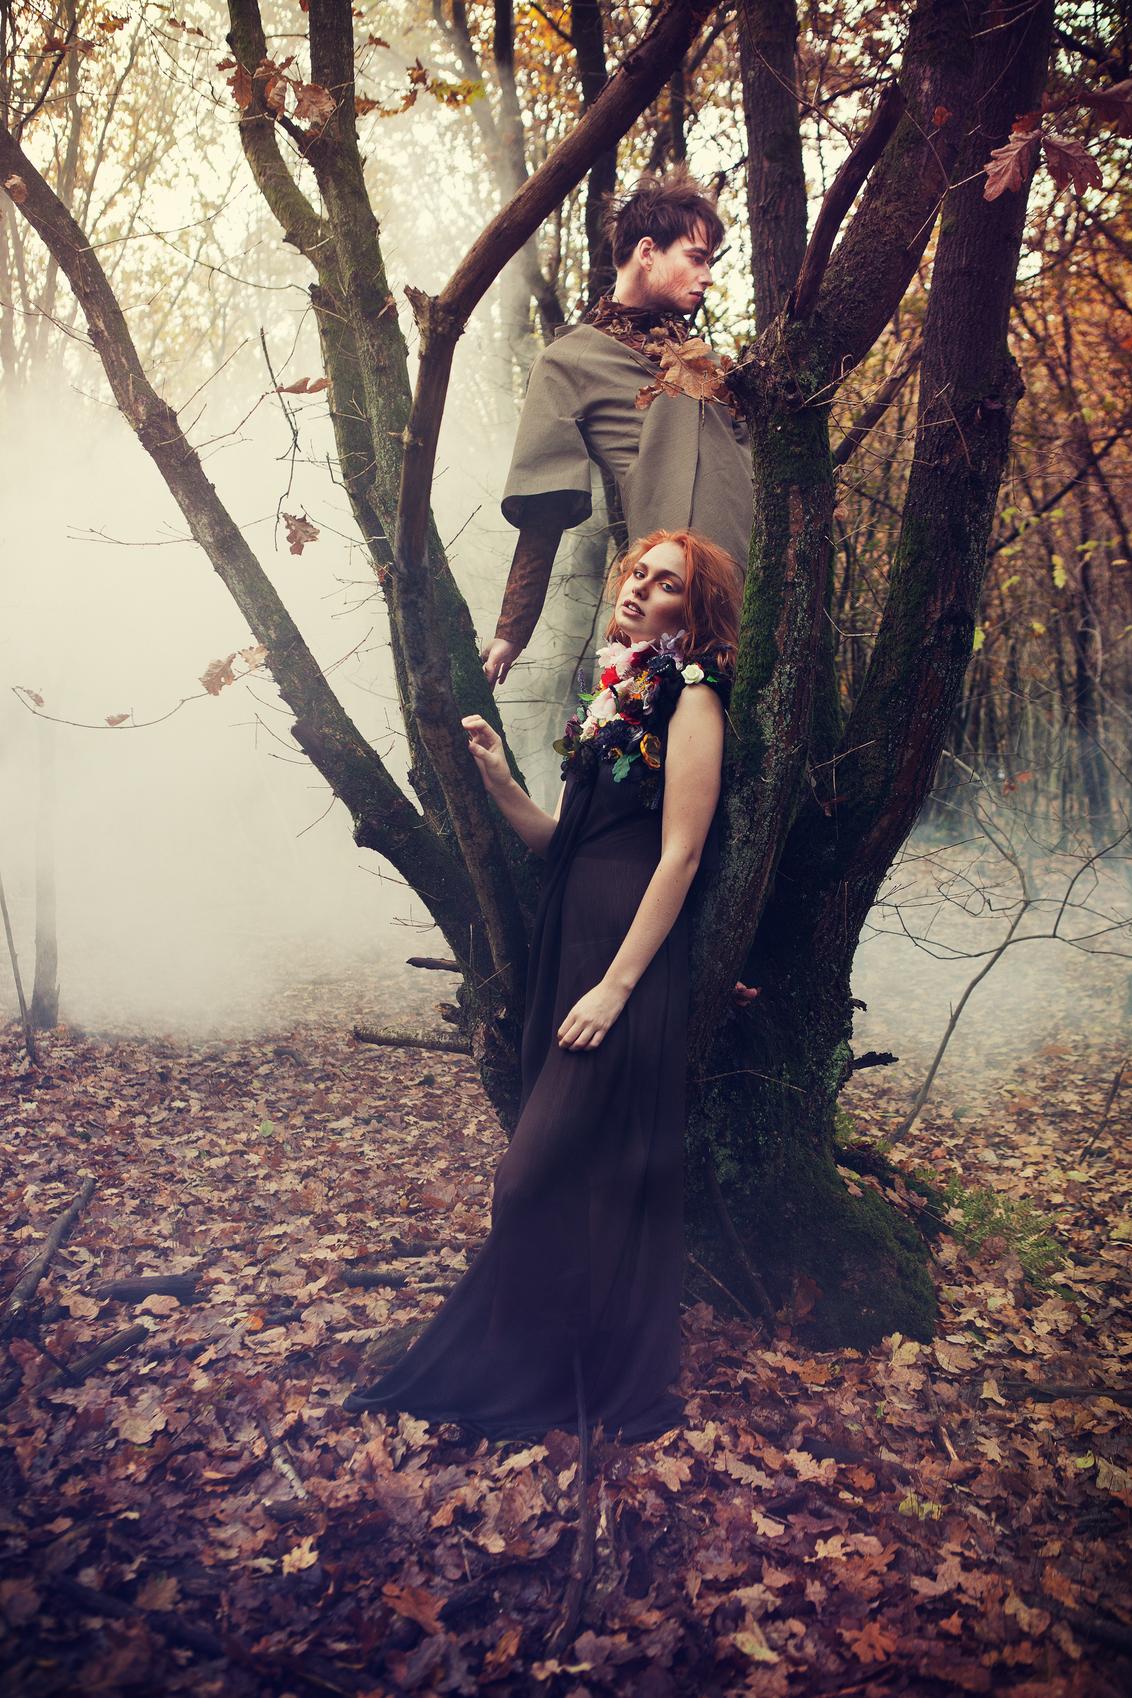 Forest Stories! - Clothing Designer: Bamba Matondo  MUAH: Maaike Buurman Model: Dawn Rose & Freddy Van Hof - foto door richardterborg op 12-01-2017 - deze foto bevat: natuur, portret, reclame, model, bos, tegenlicht, haar, fashion, meisje, schoenen, glamour, belichting, expressie, jurk, jeans, mode, fotoshoot, retro, romantisch, commercial, styling, editorial, fashionfotografie